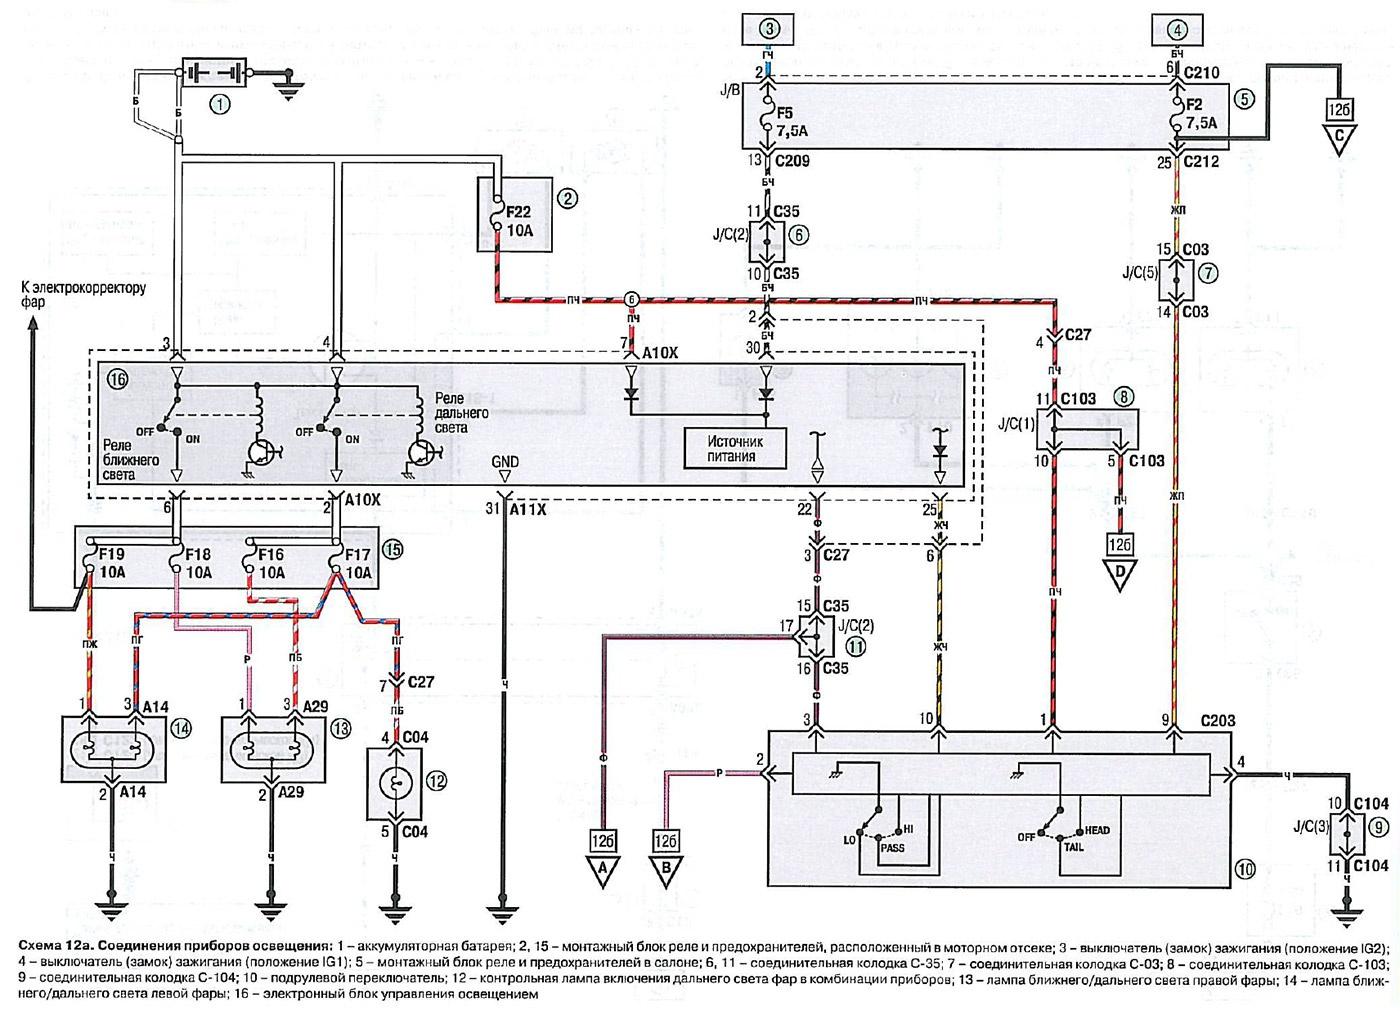 галант схема двигателя митсубиси